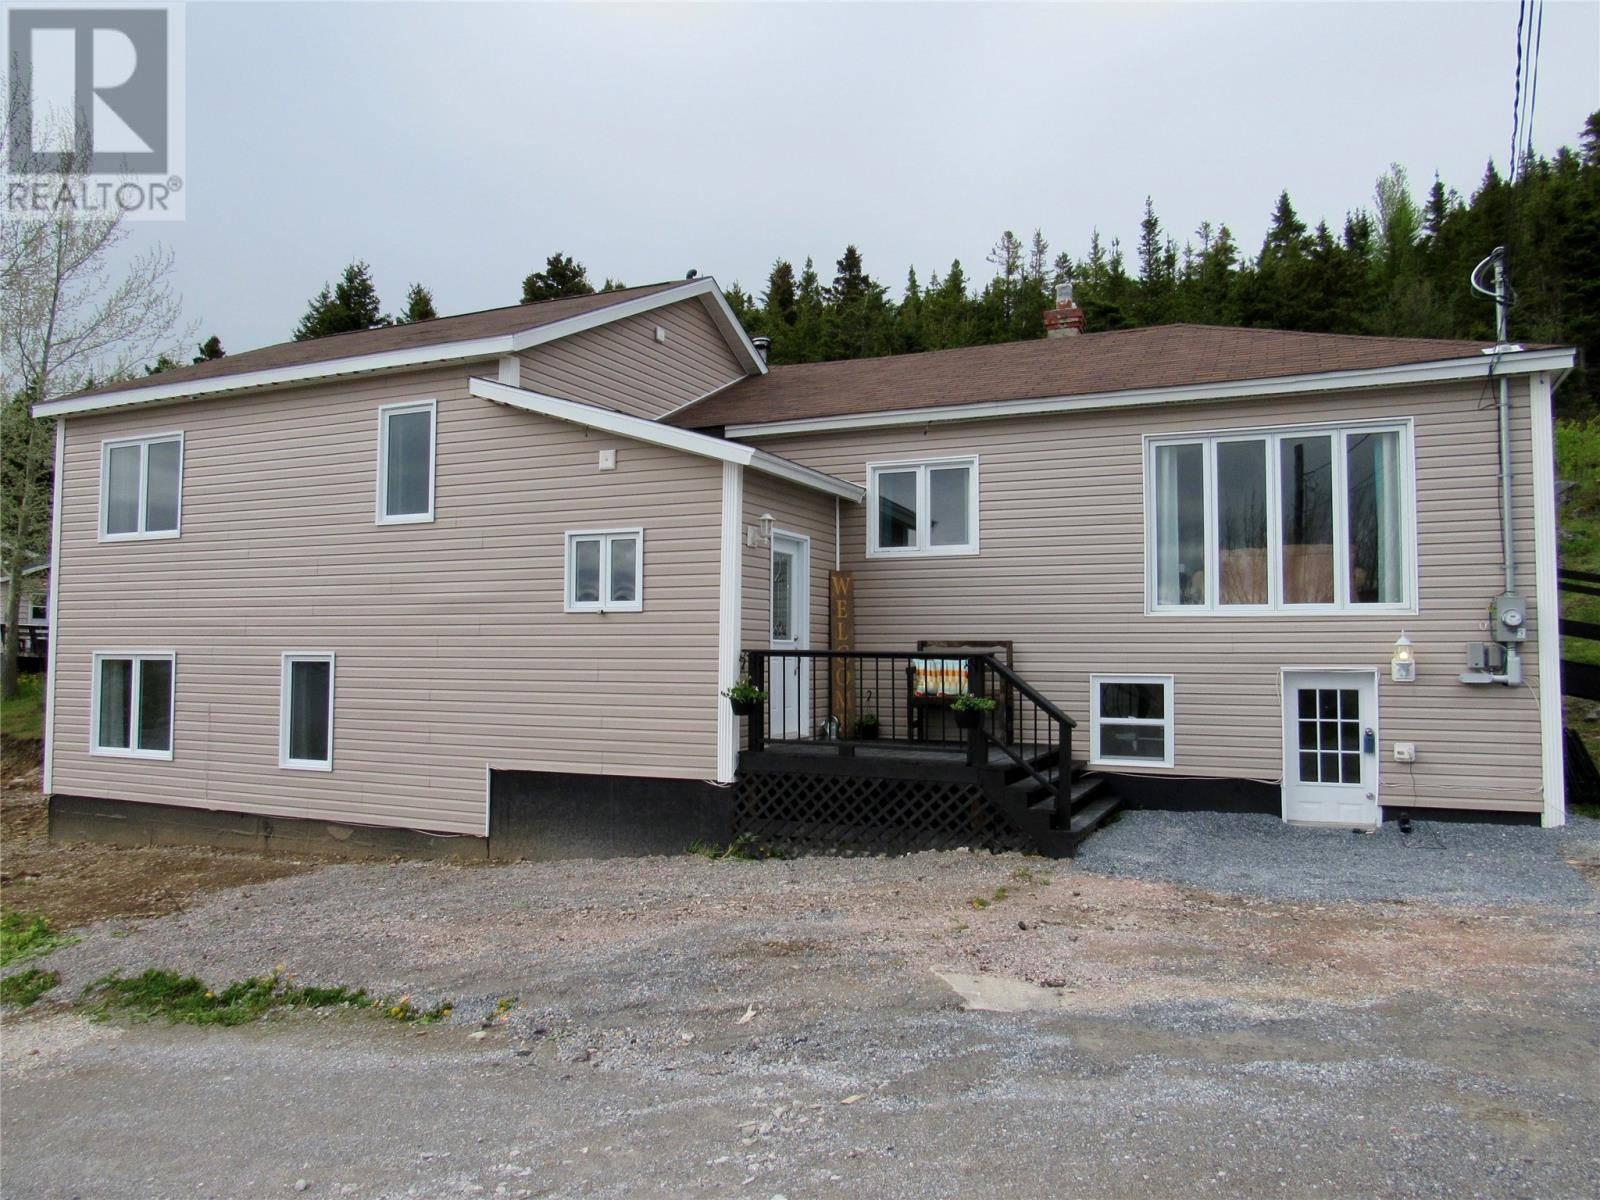 House for sale at 5 Sheppards Rd Irishtown-summerside Newfoundland - MLS: 1197809